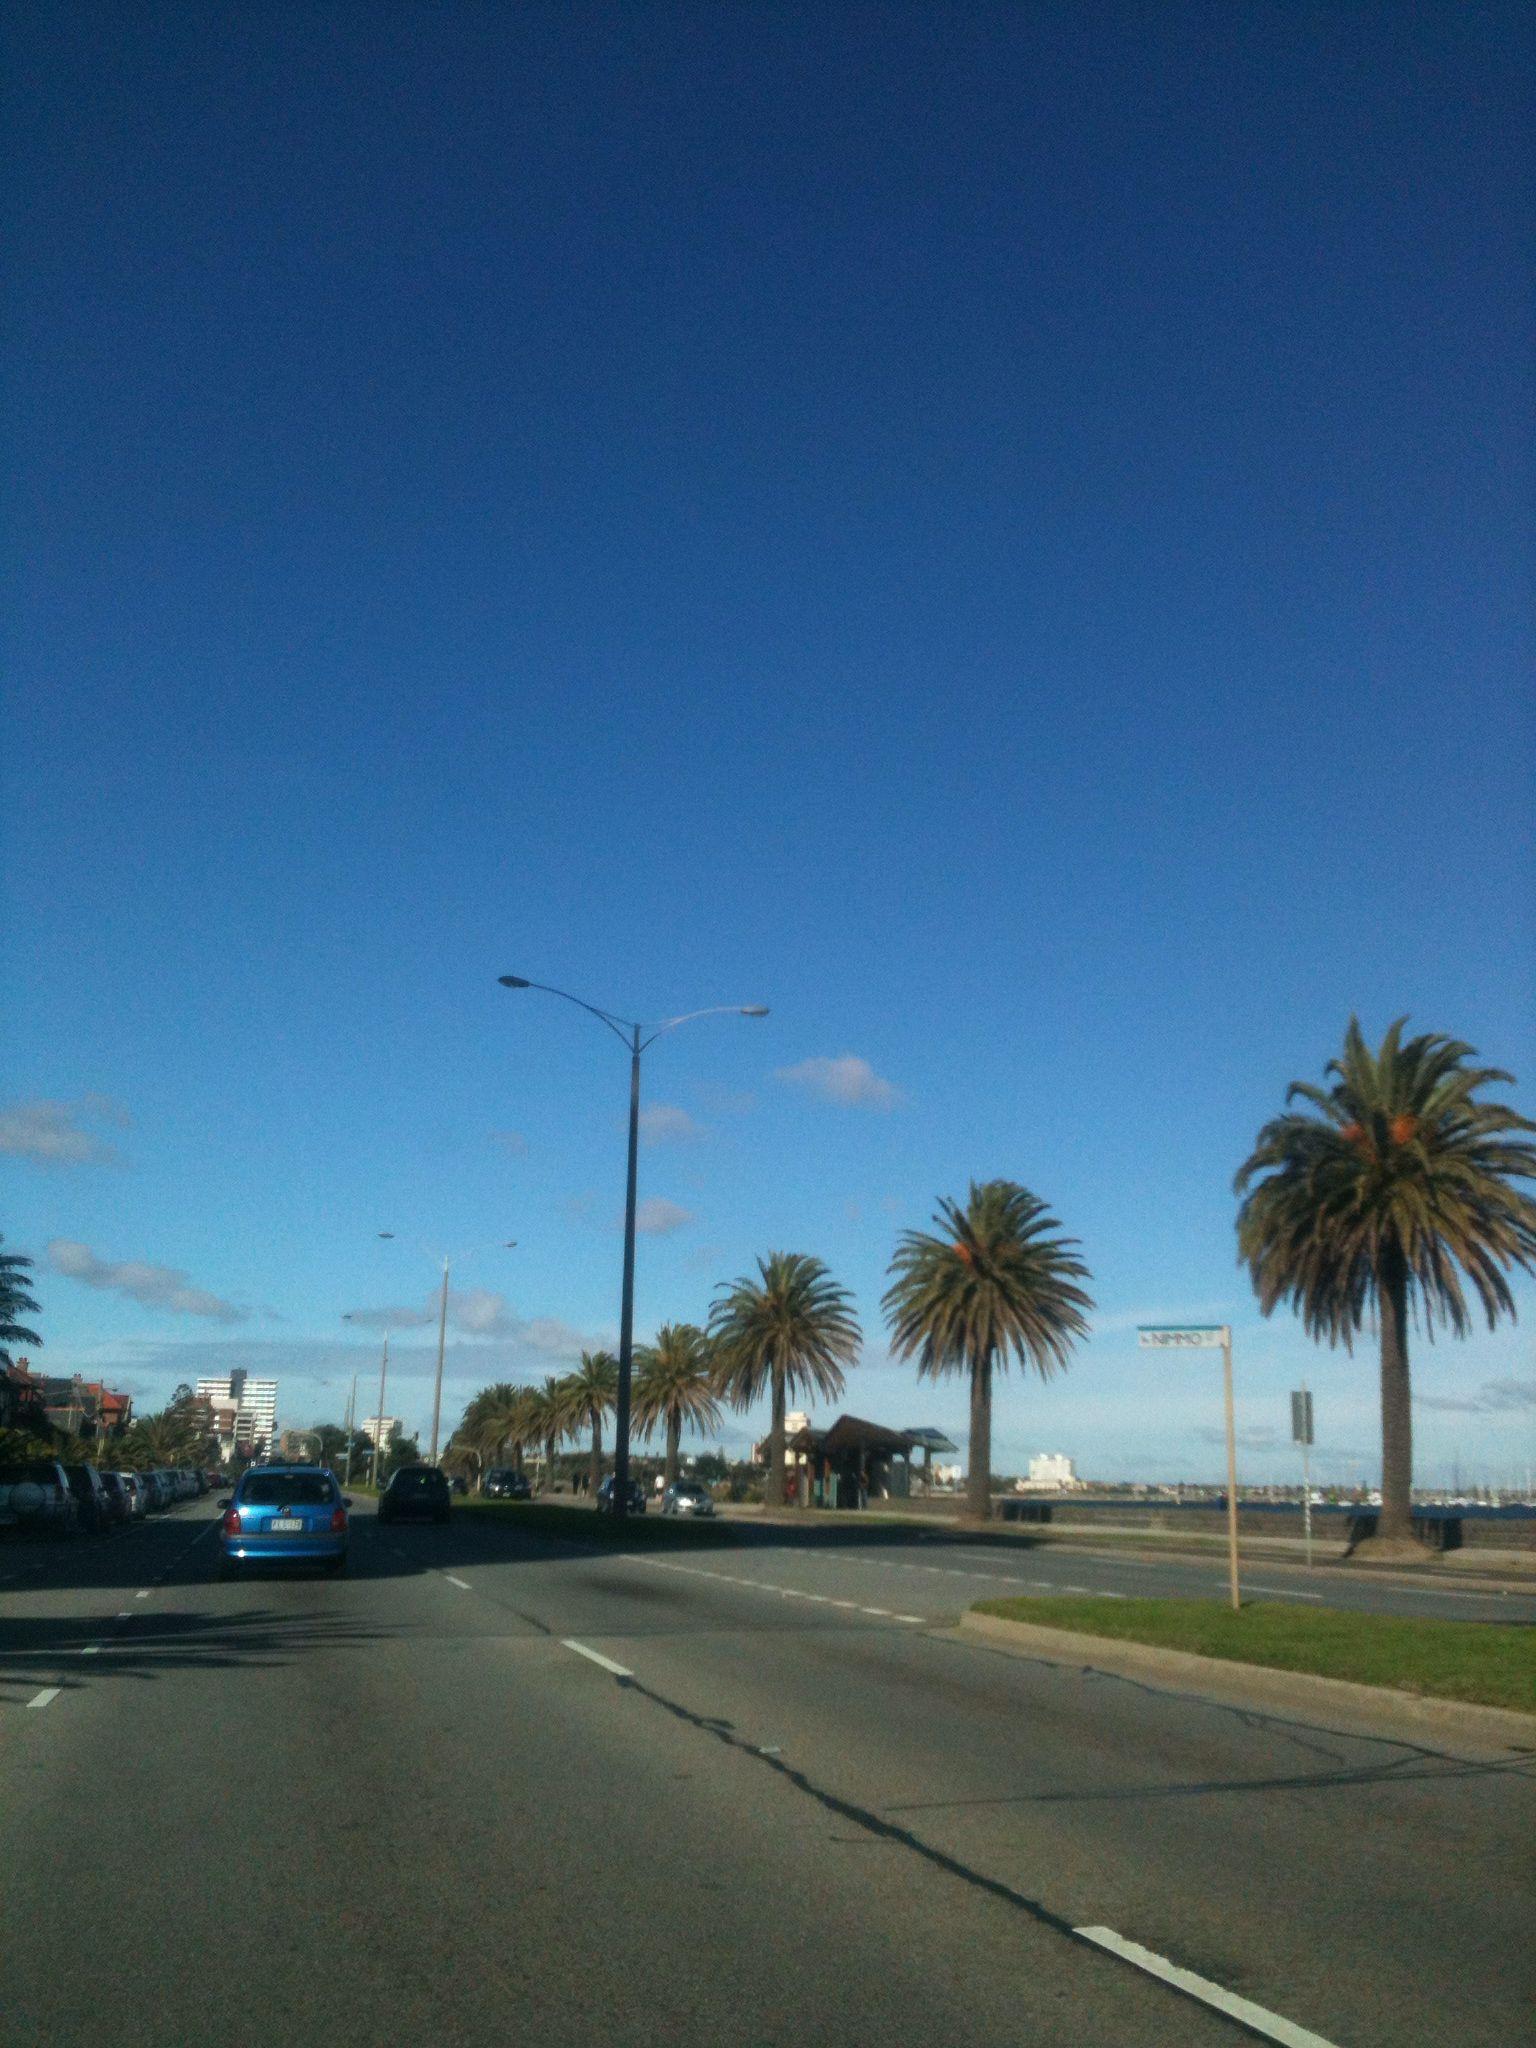 Melbourne, Australia Australia, Melbourne, Utility pole